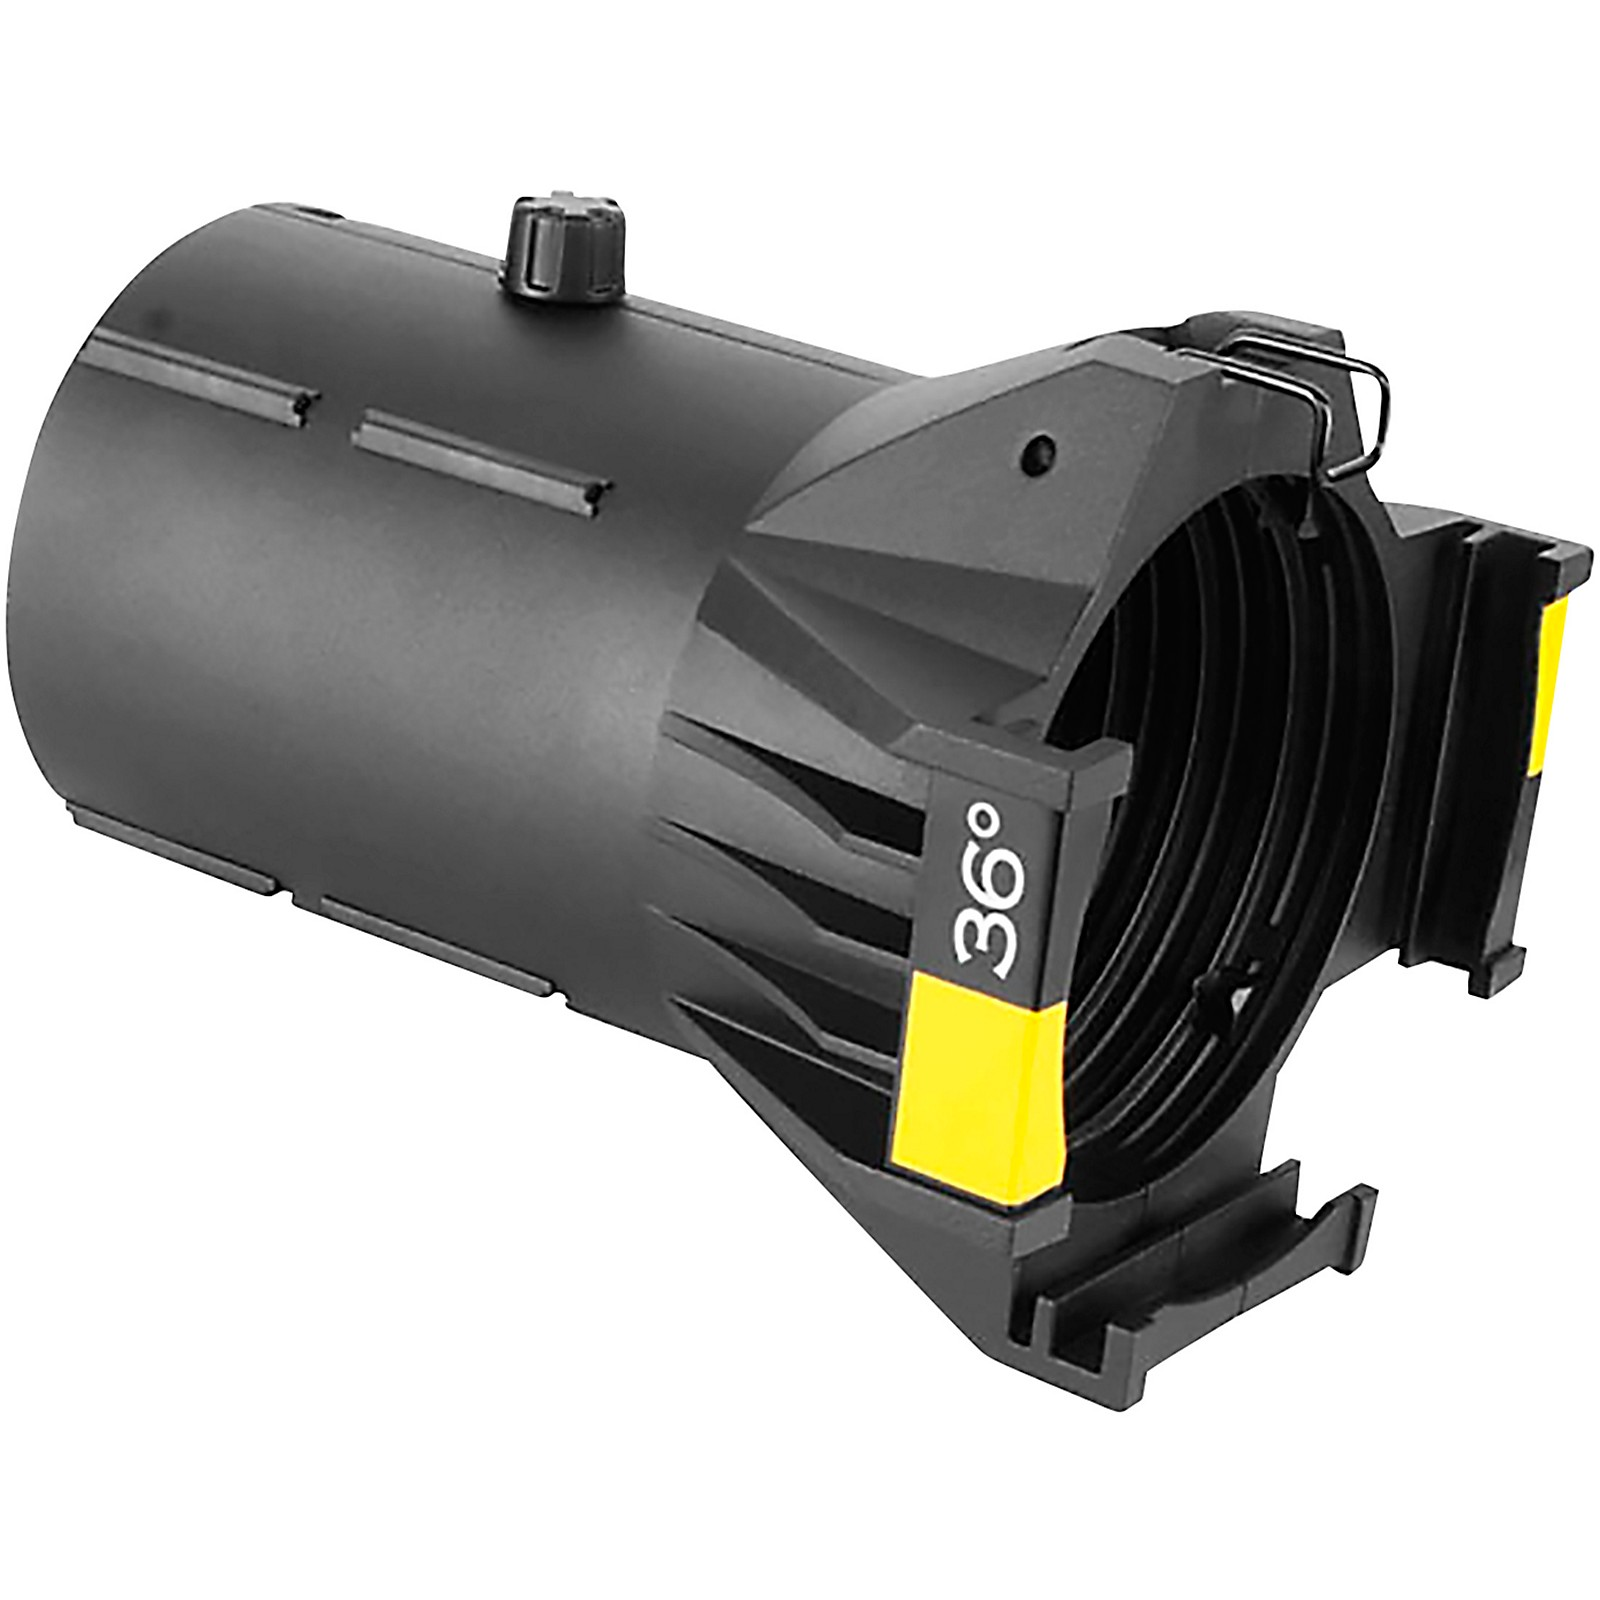 CHAUVET Professional Ovation Ellipsoidal 36 HD Lens Tube